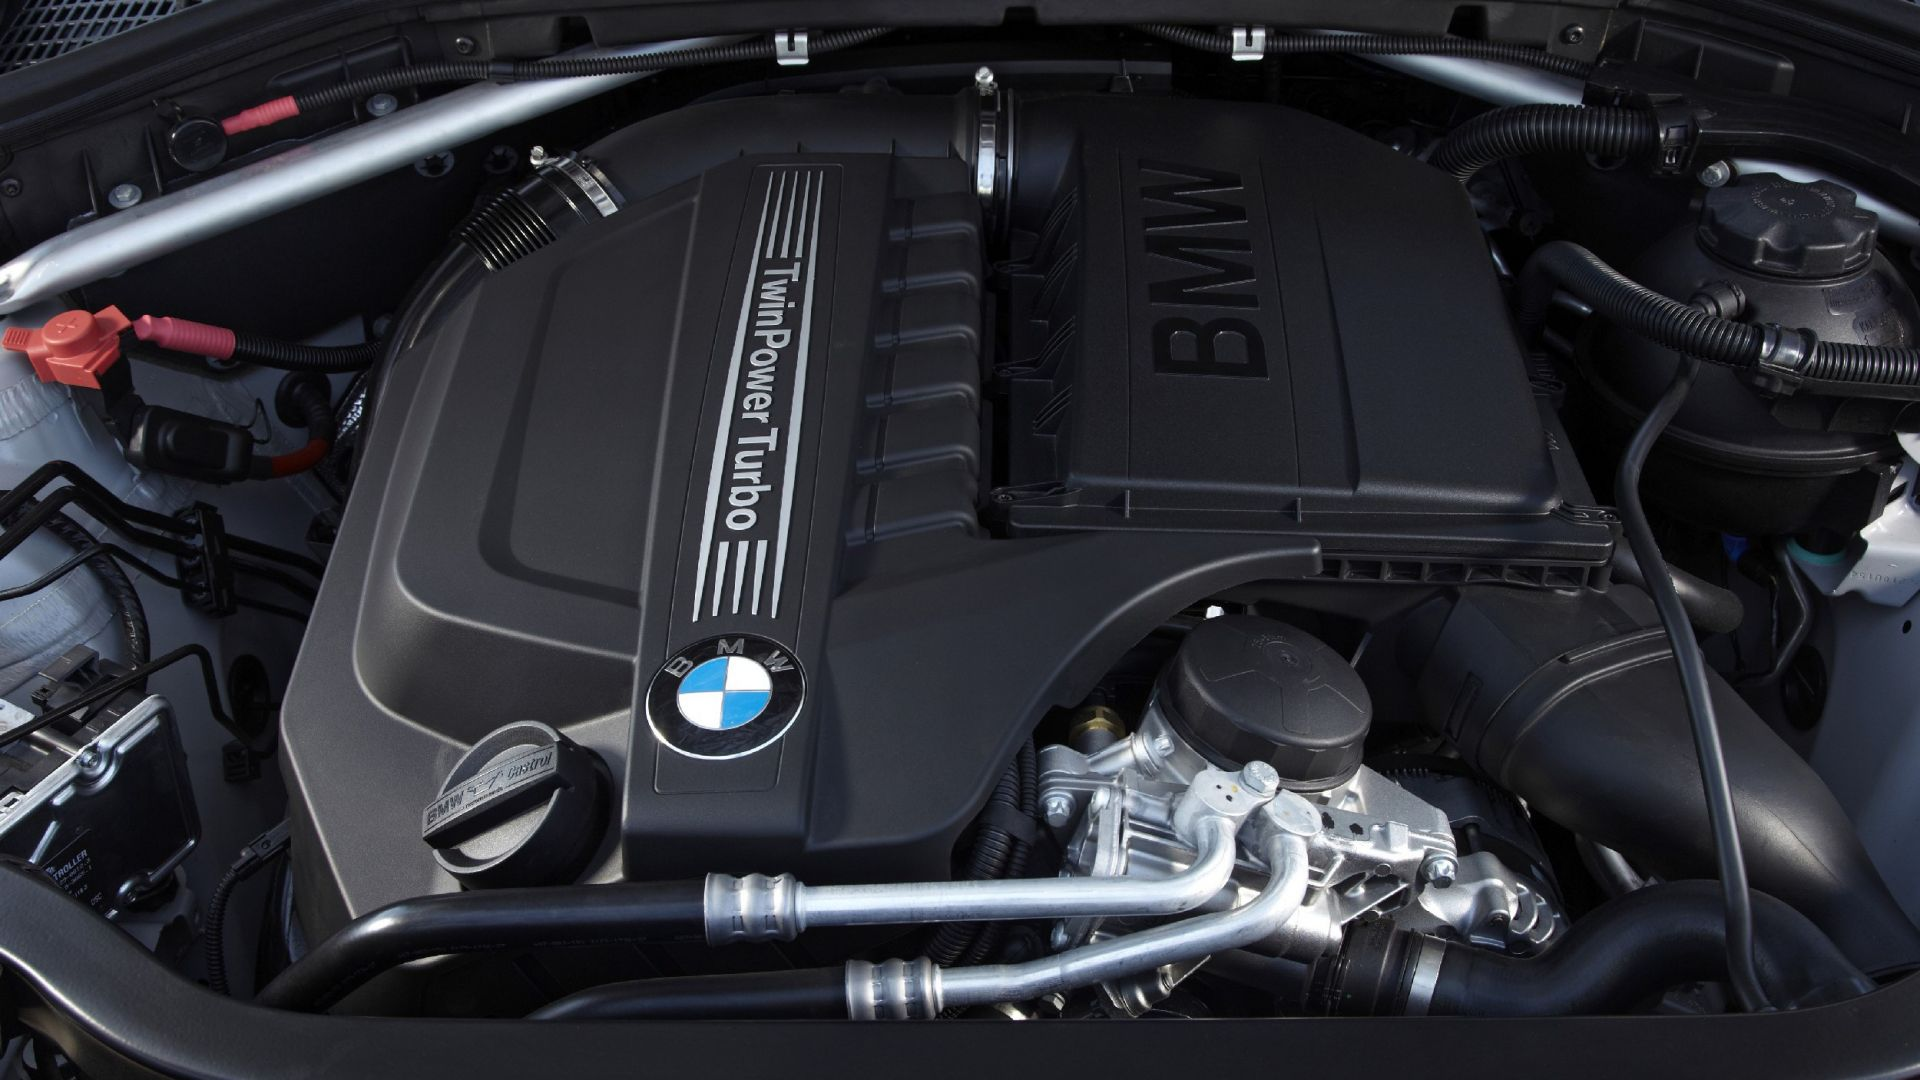 https://media.motorbox.com/image/bmw-x3-2011-1/3/1/3/313510/313510-16x9-lg.jpg